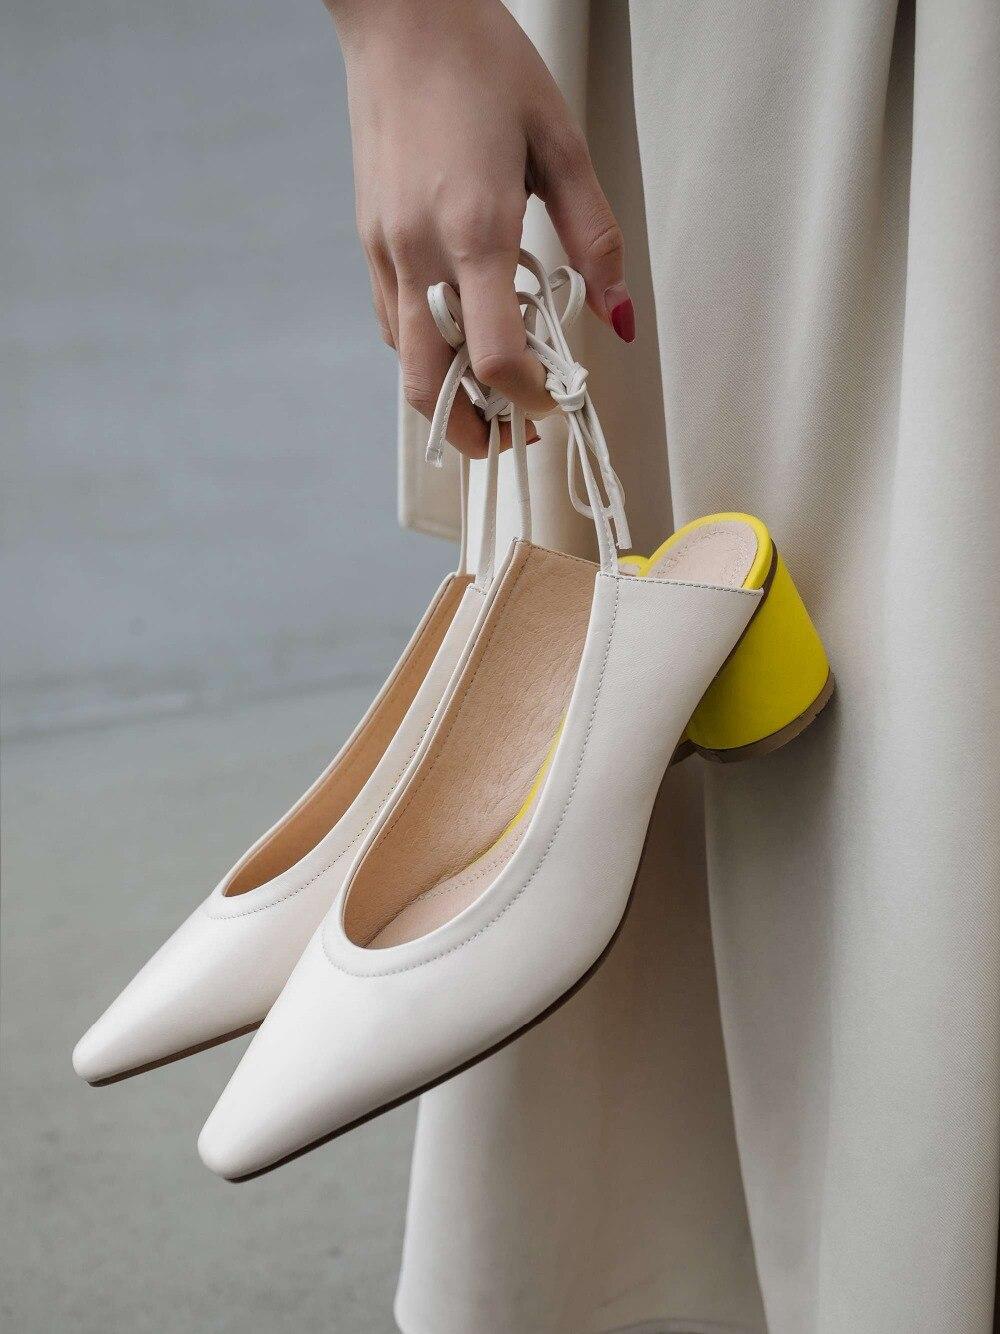 Krazing หม้อ sweet elegant lady slingback ศิลปะสแควร์ toe รอบรองเท้าส้นสูง lace up movie star รันเวย์แฟชั่นผสมสีรองเท้า l9f8-ใน รองเท้าส้นสูงสตรี จาก รองเท้า บน   2